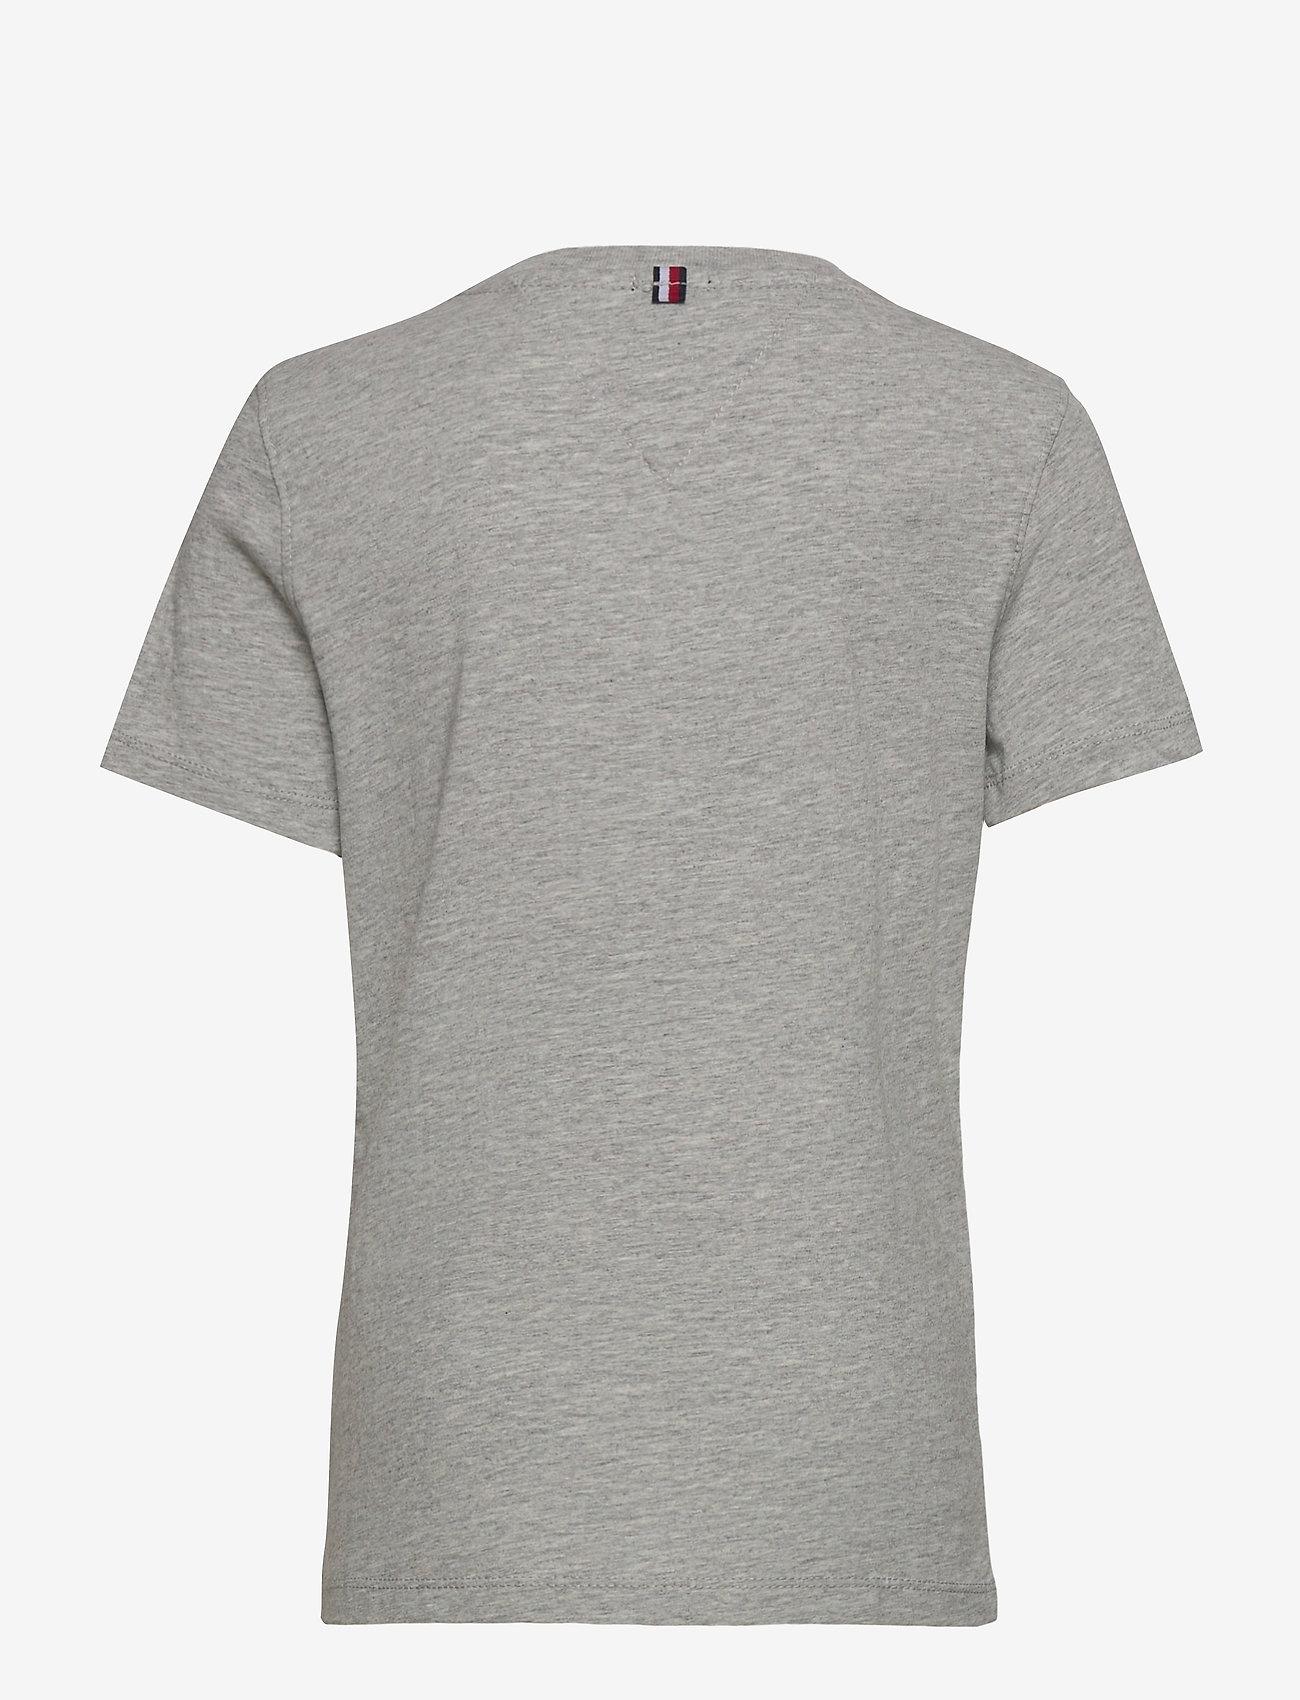 Tommy Hilfiger - BOYS BASIC CN KNIT S - short-sleeved - grey heather - 1